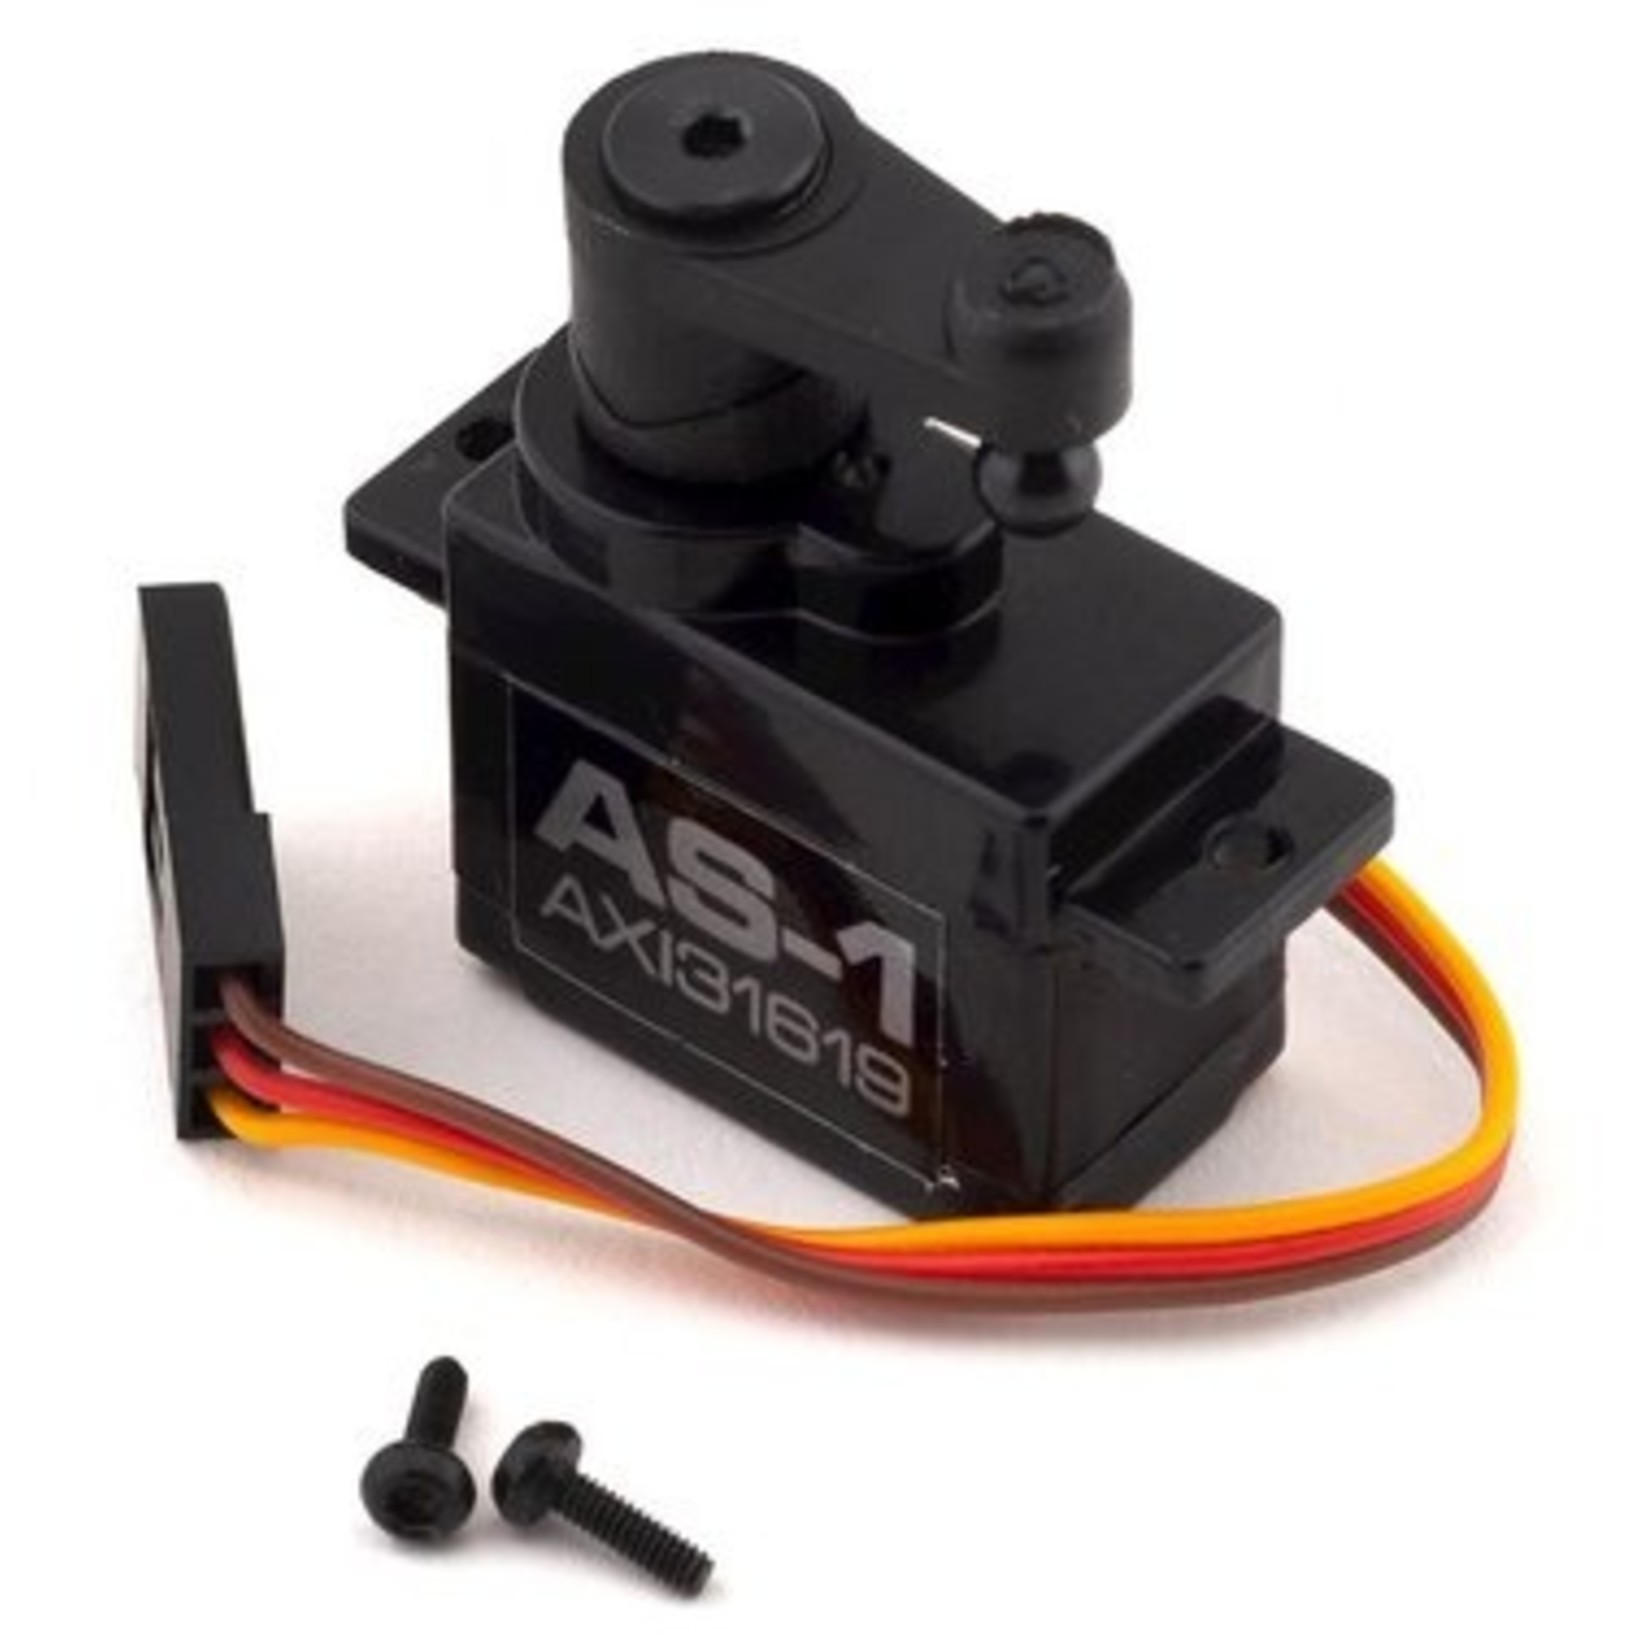 Axial AXI31619 Axial AS-1 Micro Servo